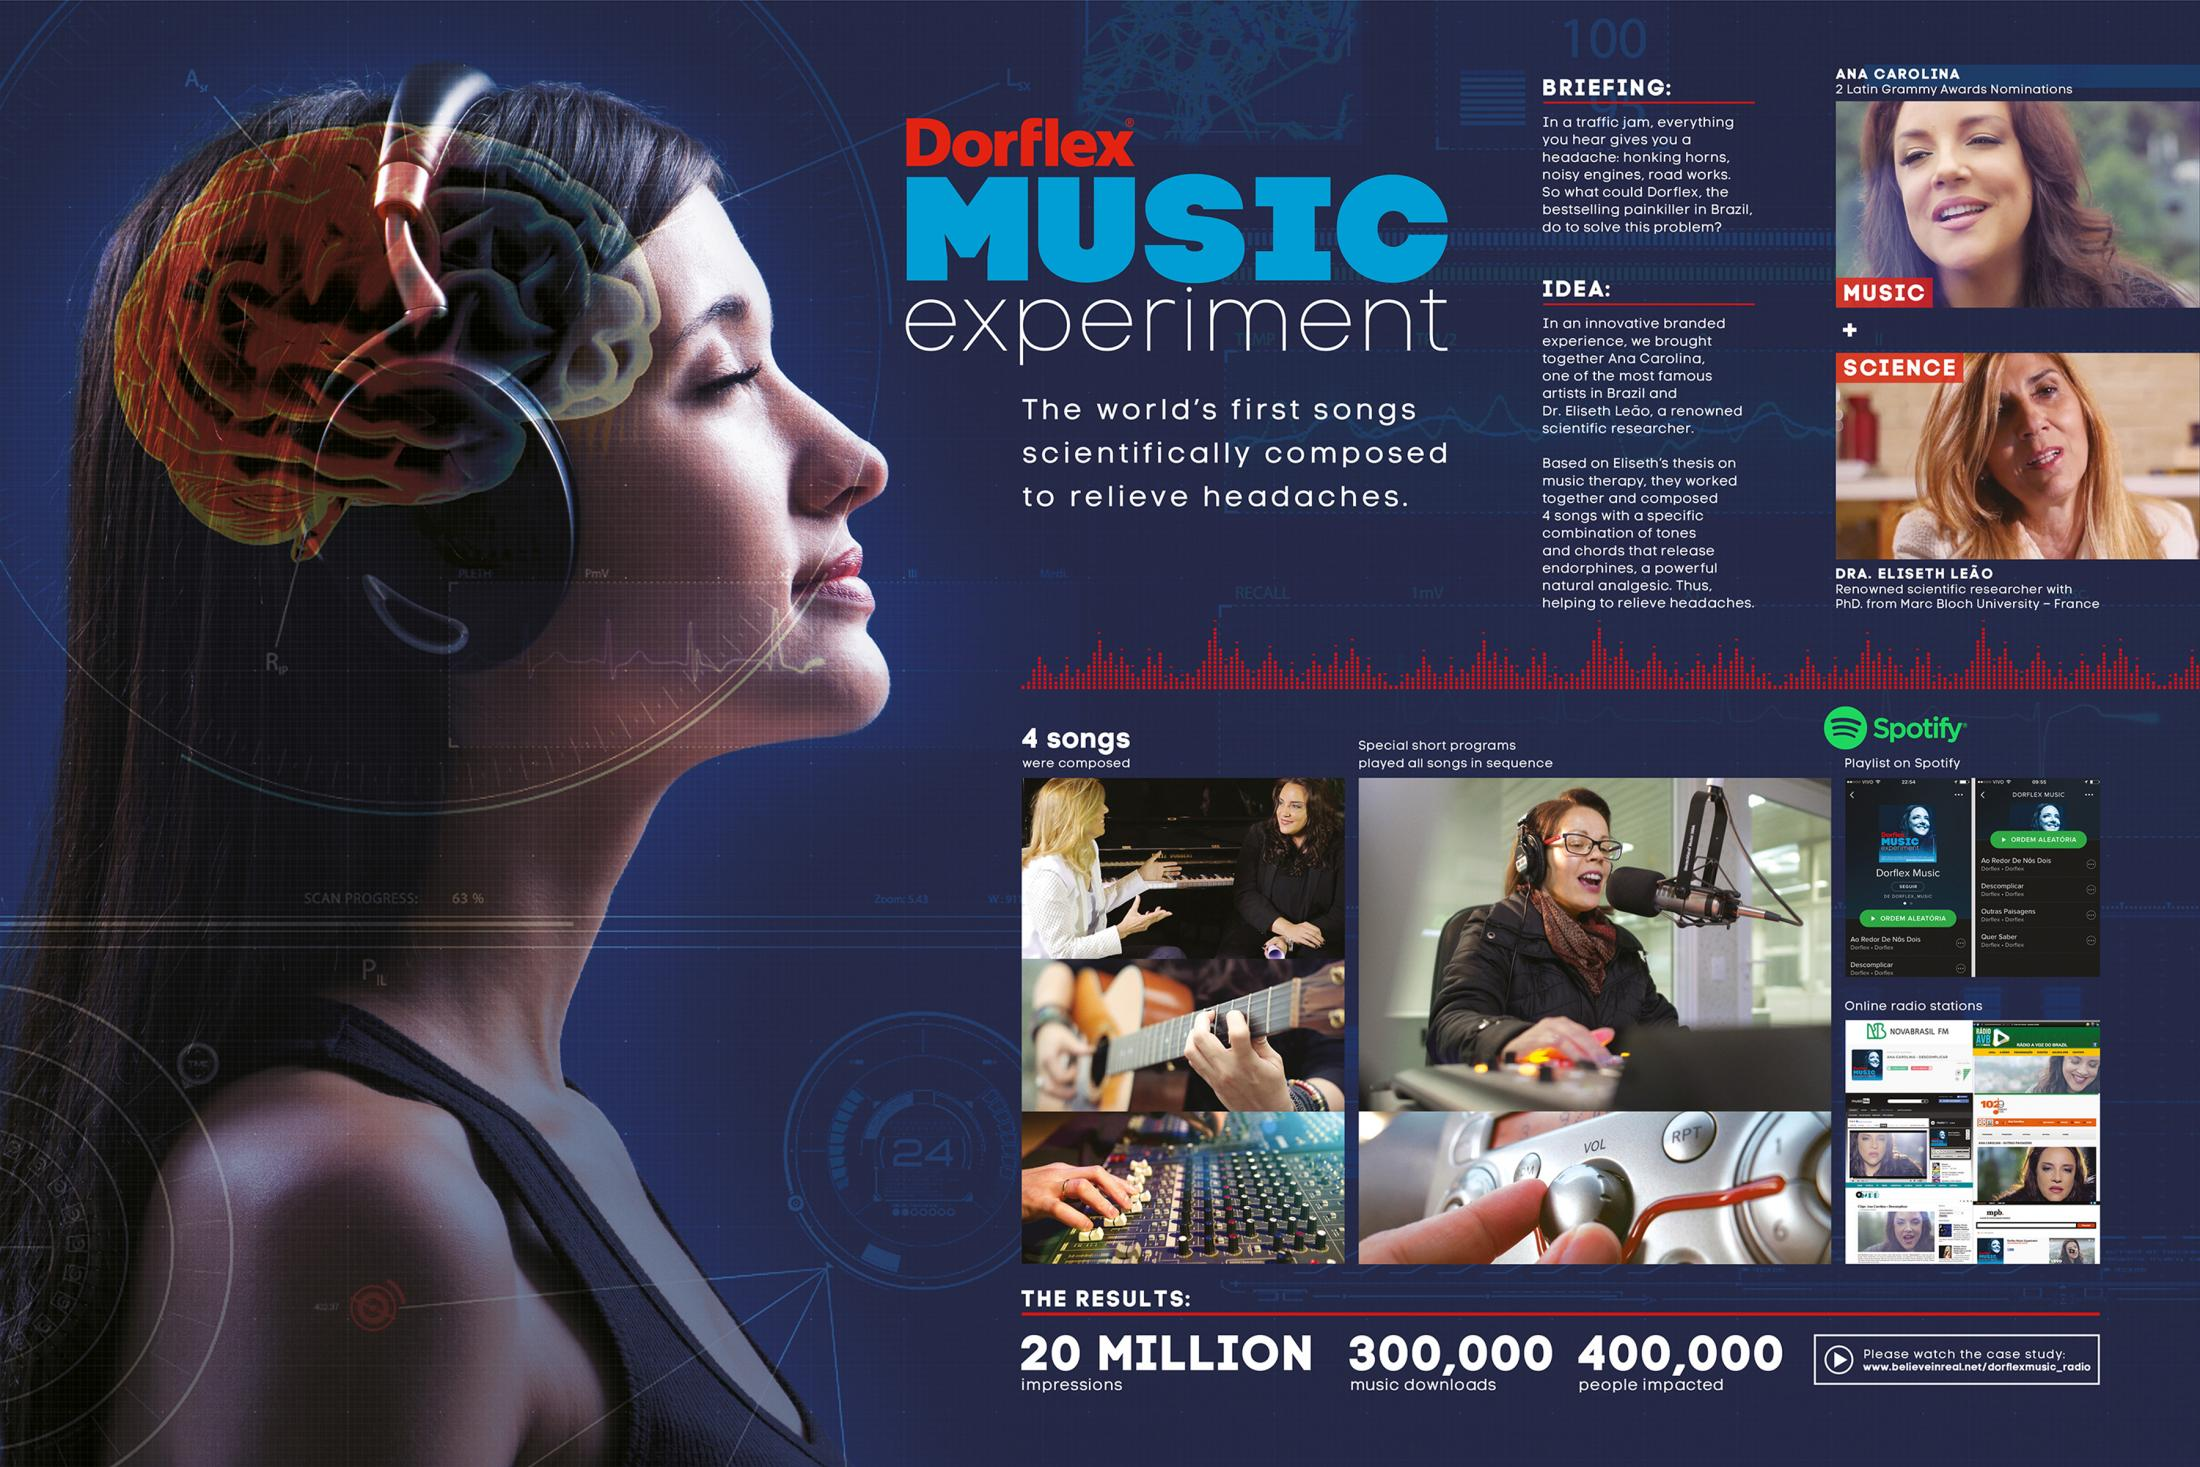 Thumbnail for Dorflex Music Experiment